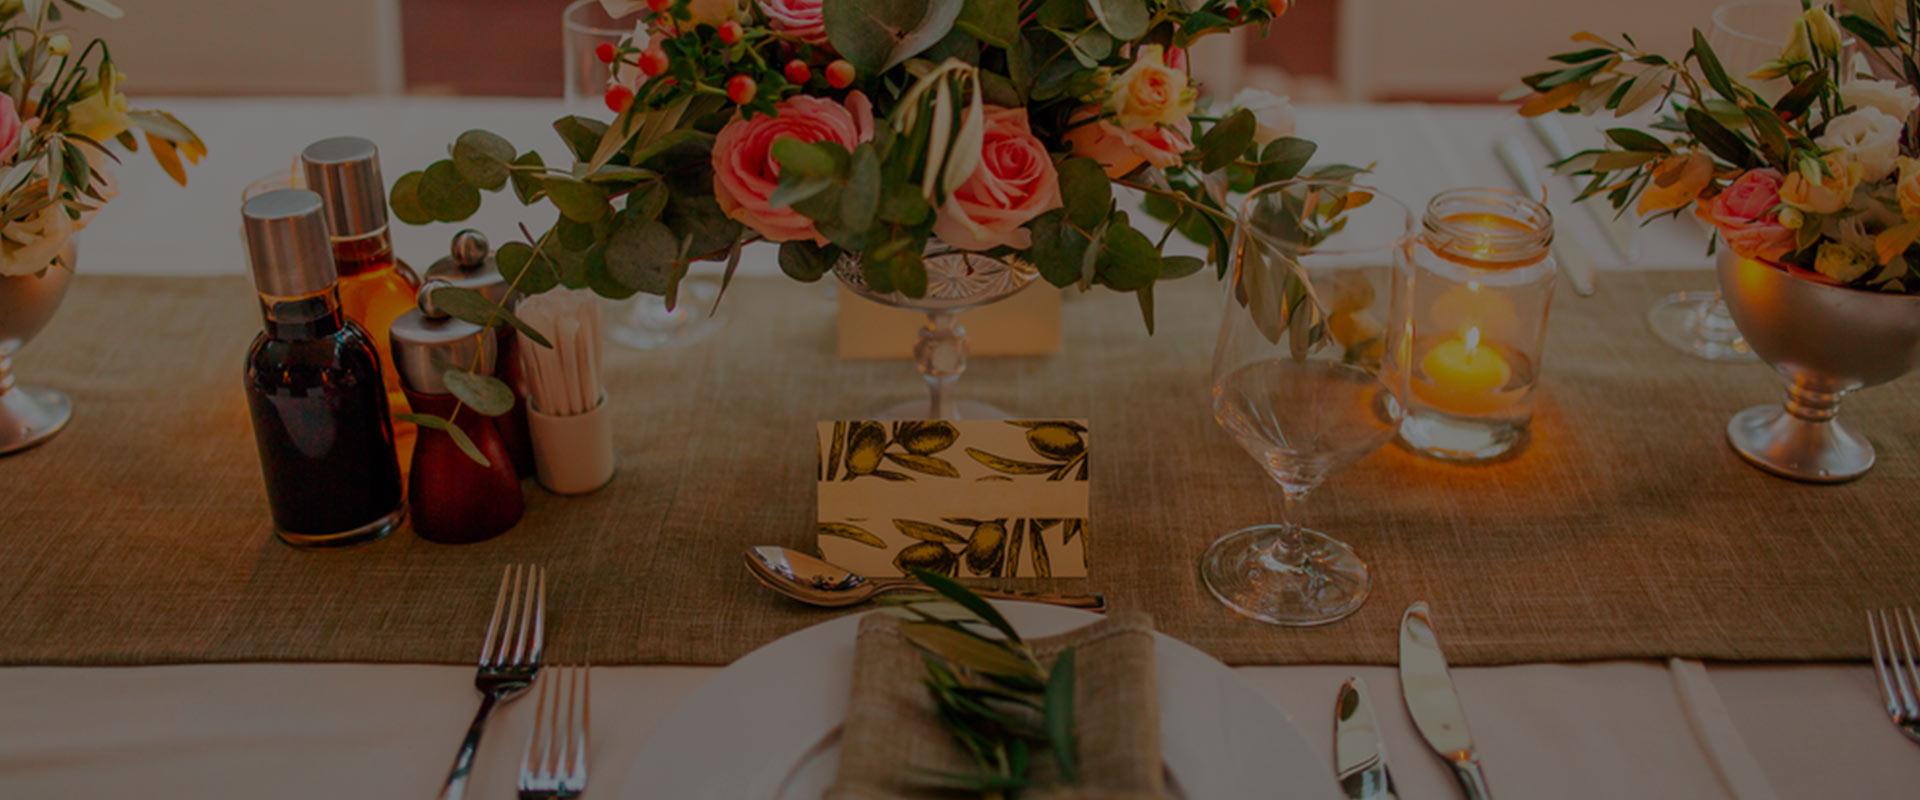 Servizi Daniela Mengarelli | Event & Flower Design